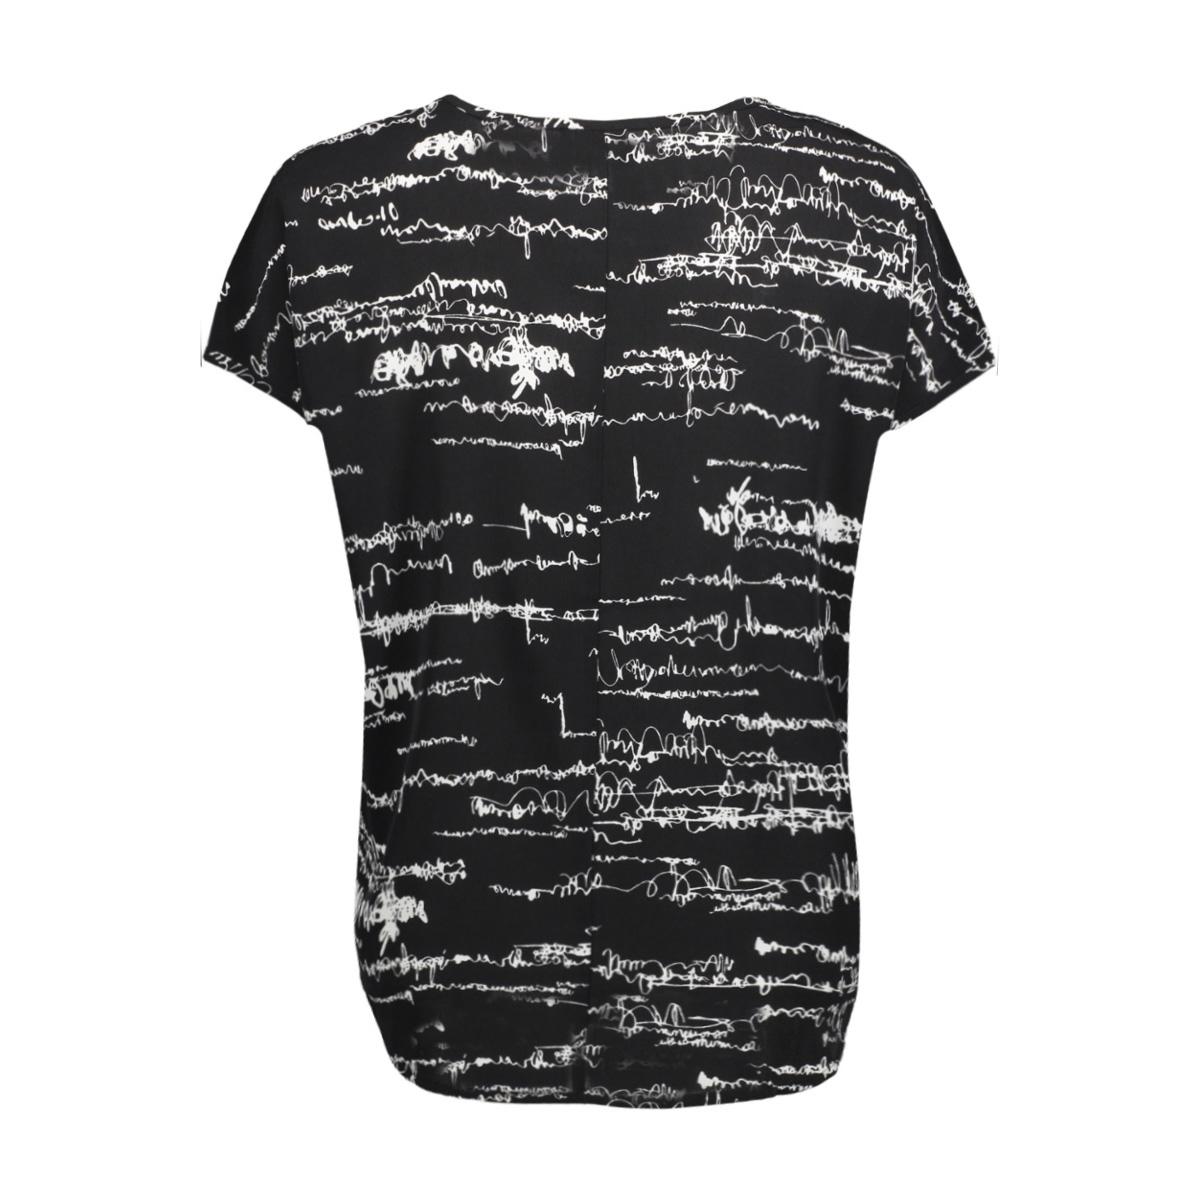 jdymelanie s/s top wvn fs 15137090 jacqueline de yong t-shirt black/ melanie